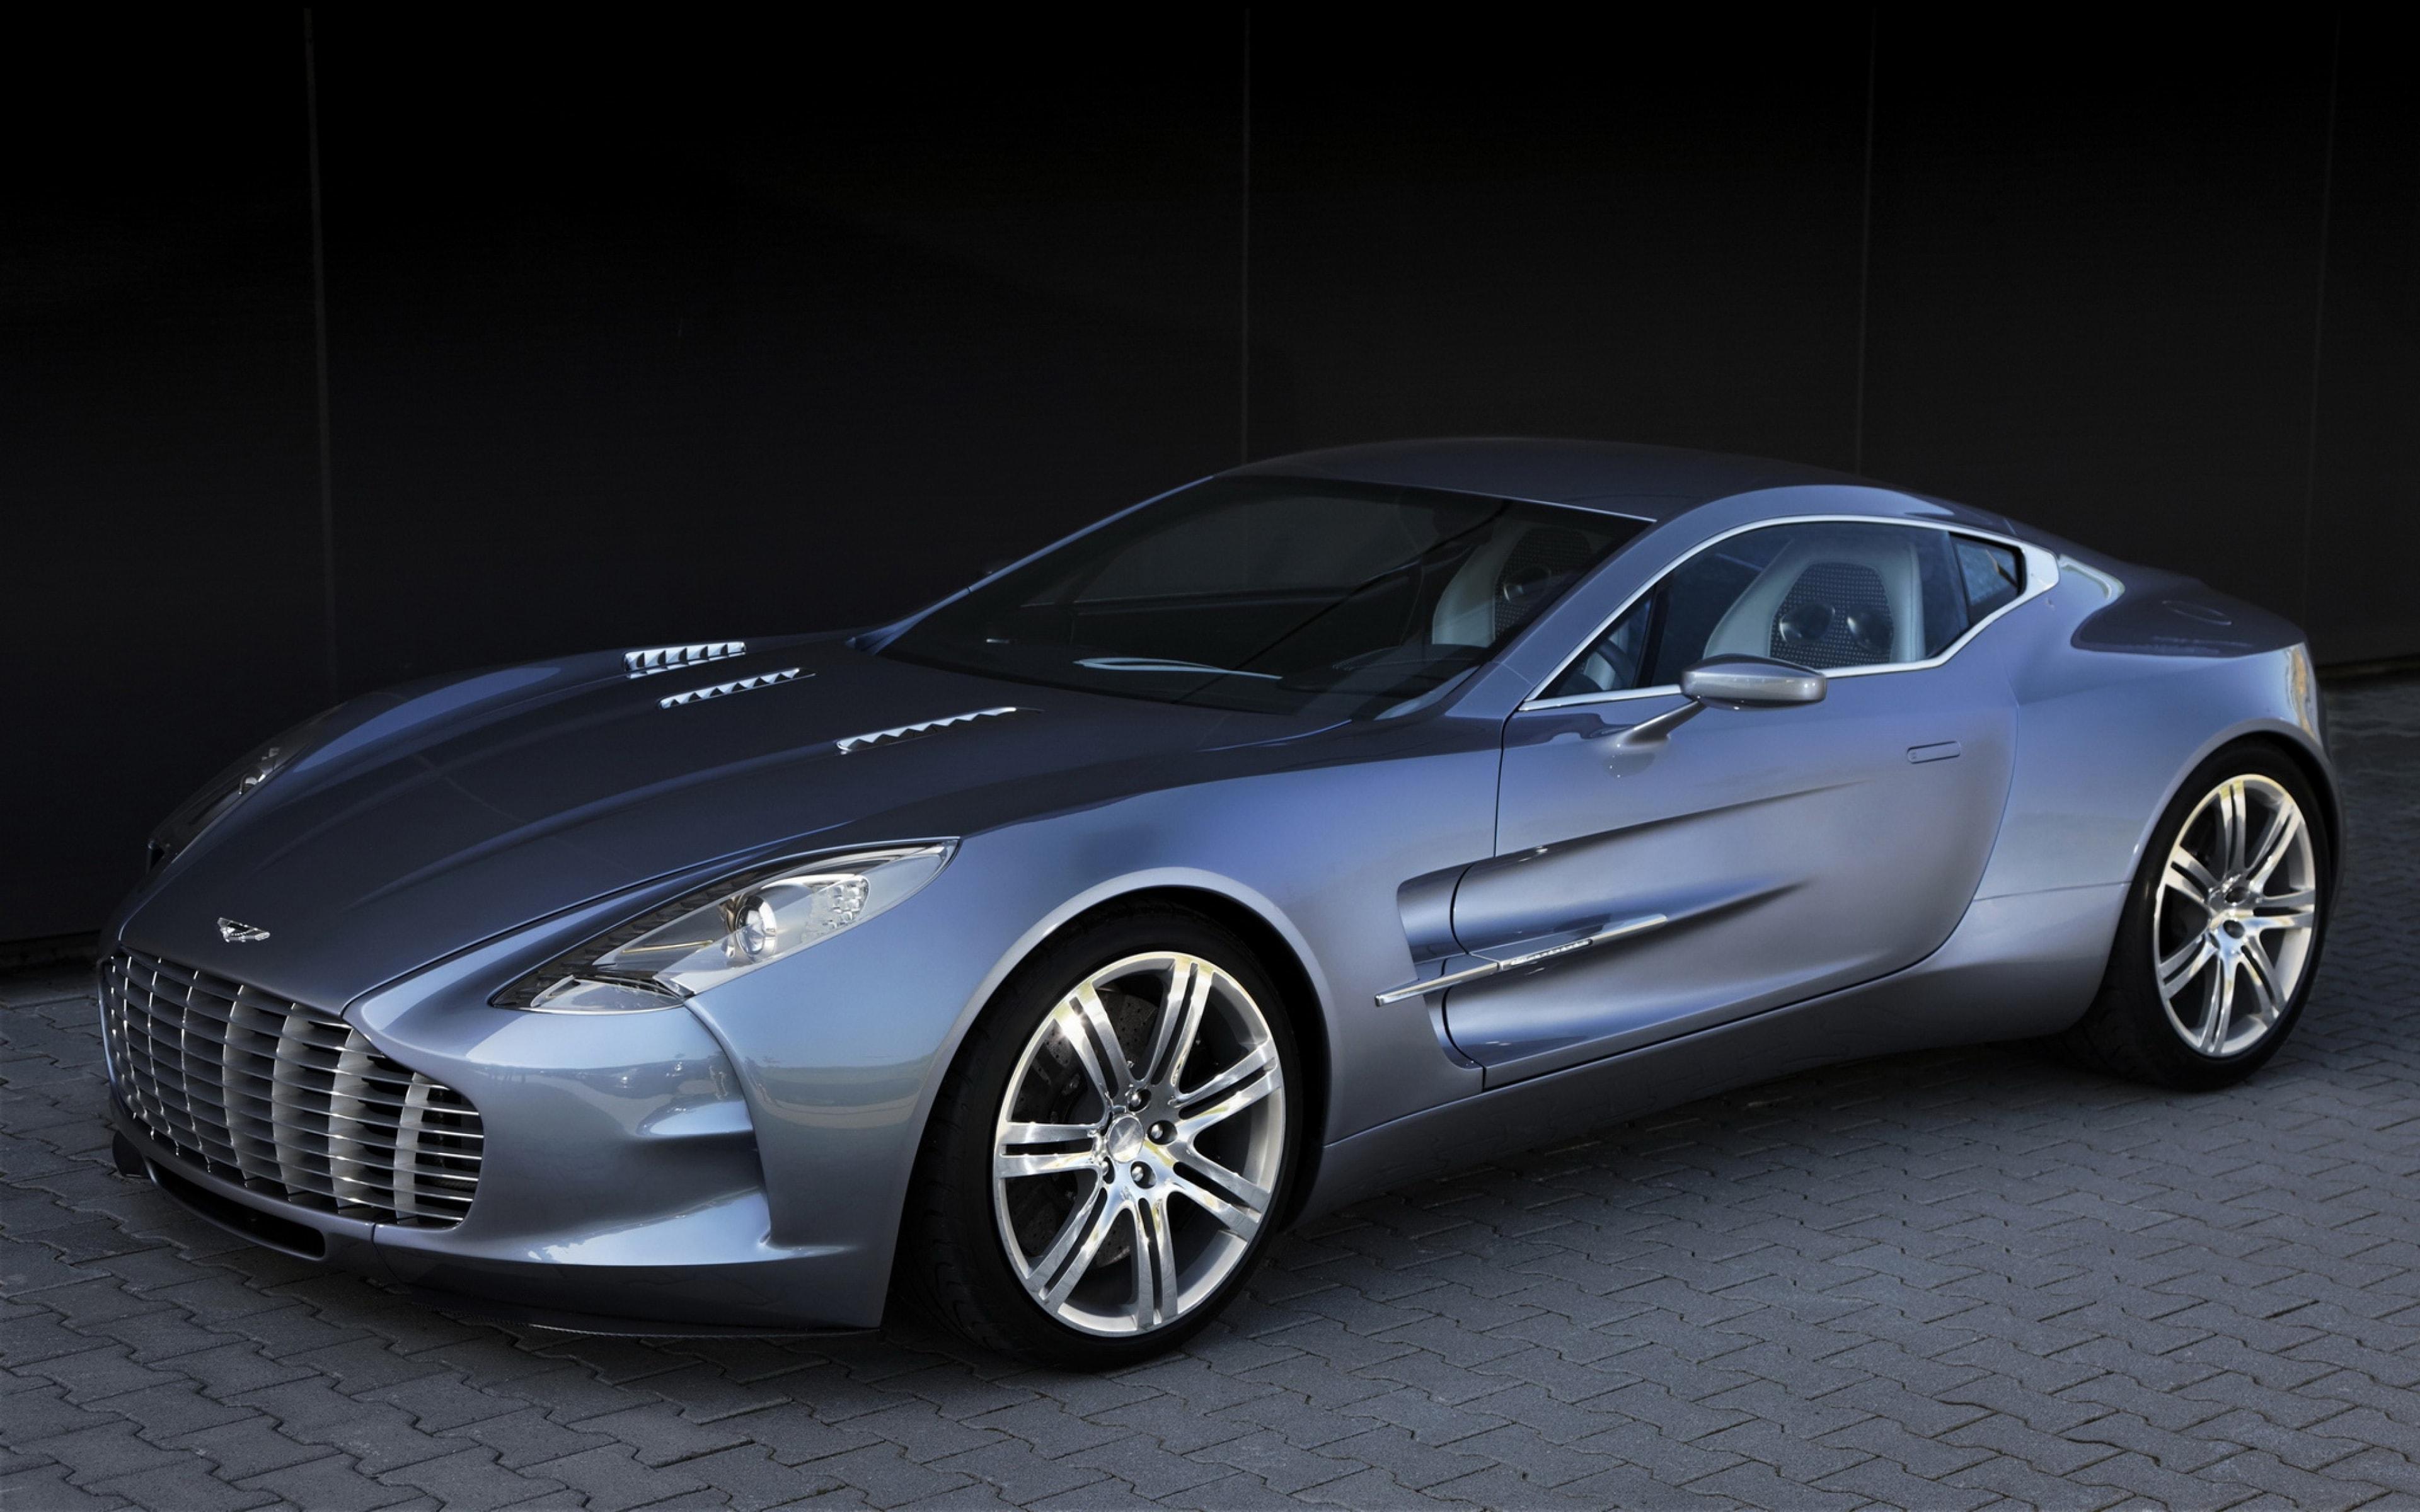 Aston Martin One-77 High